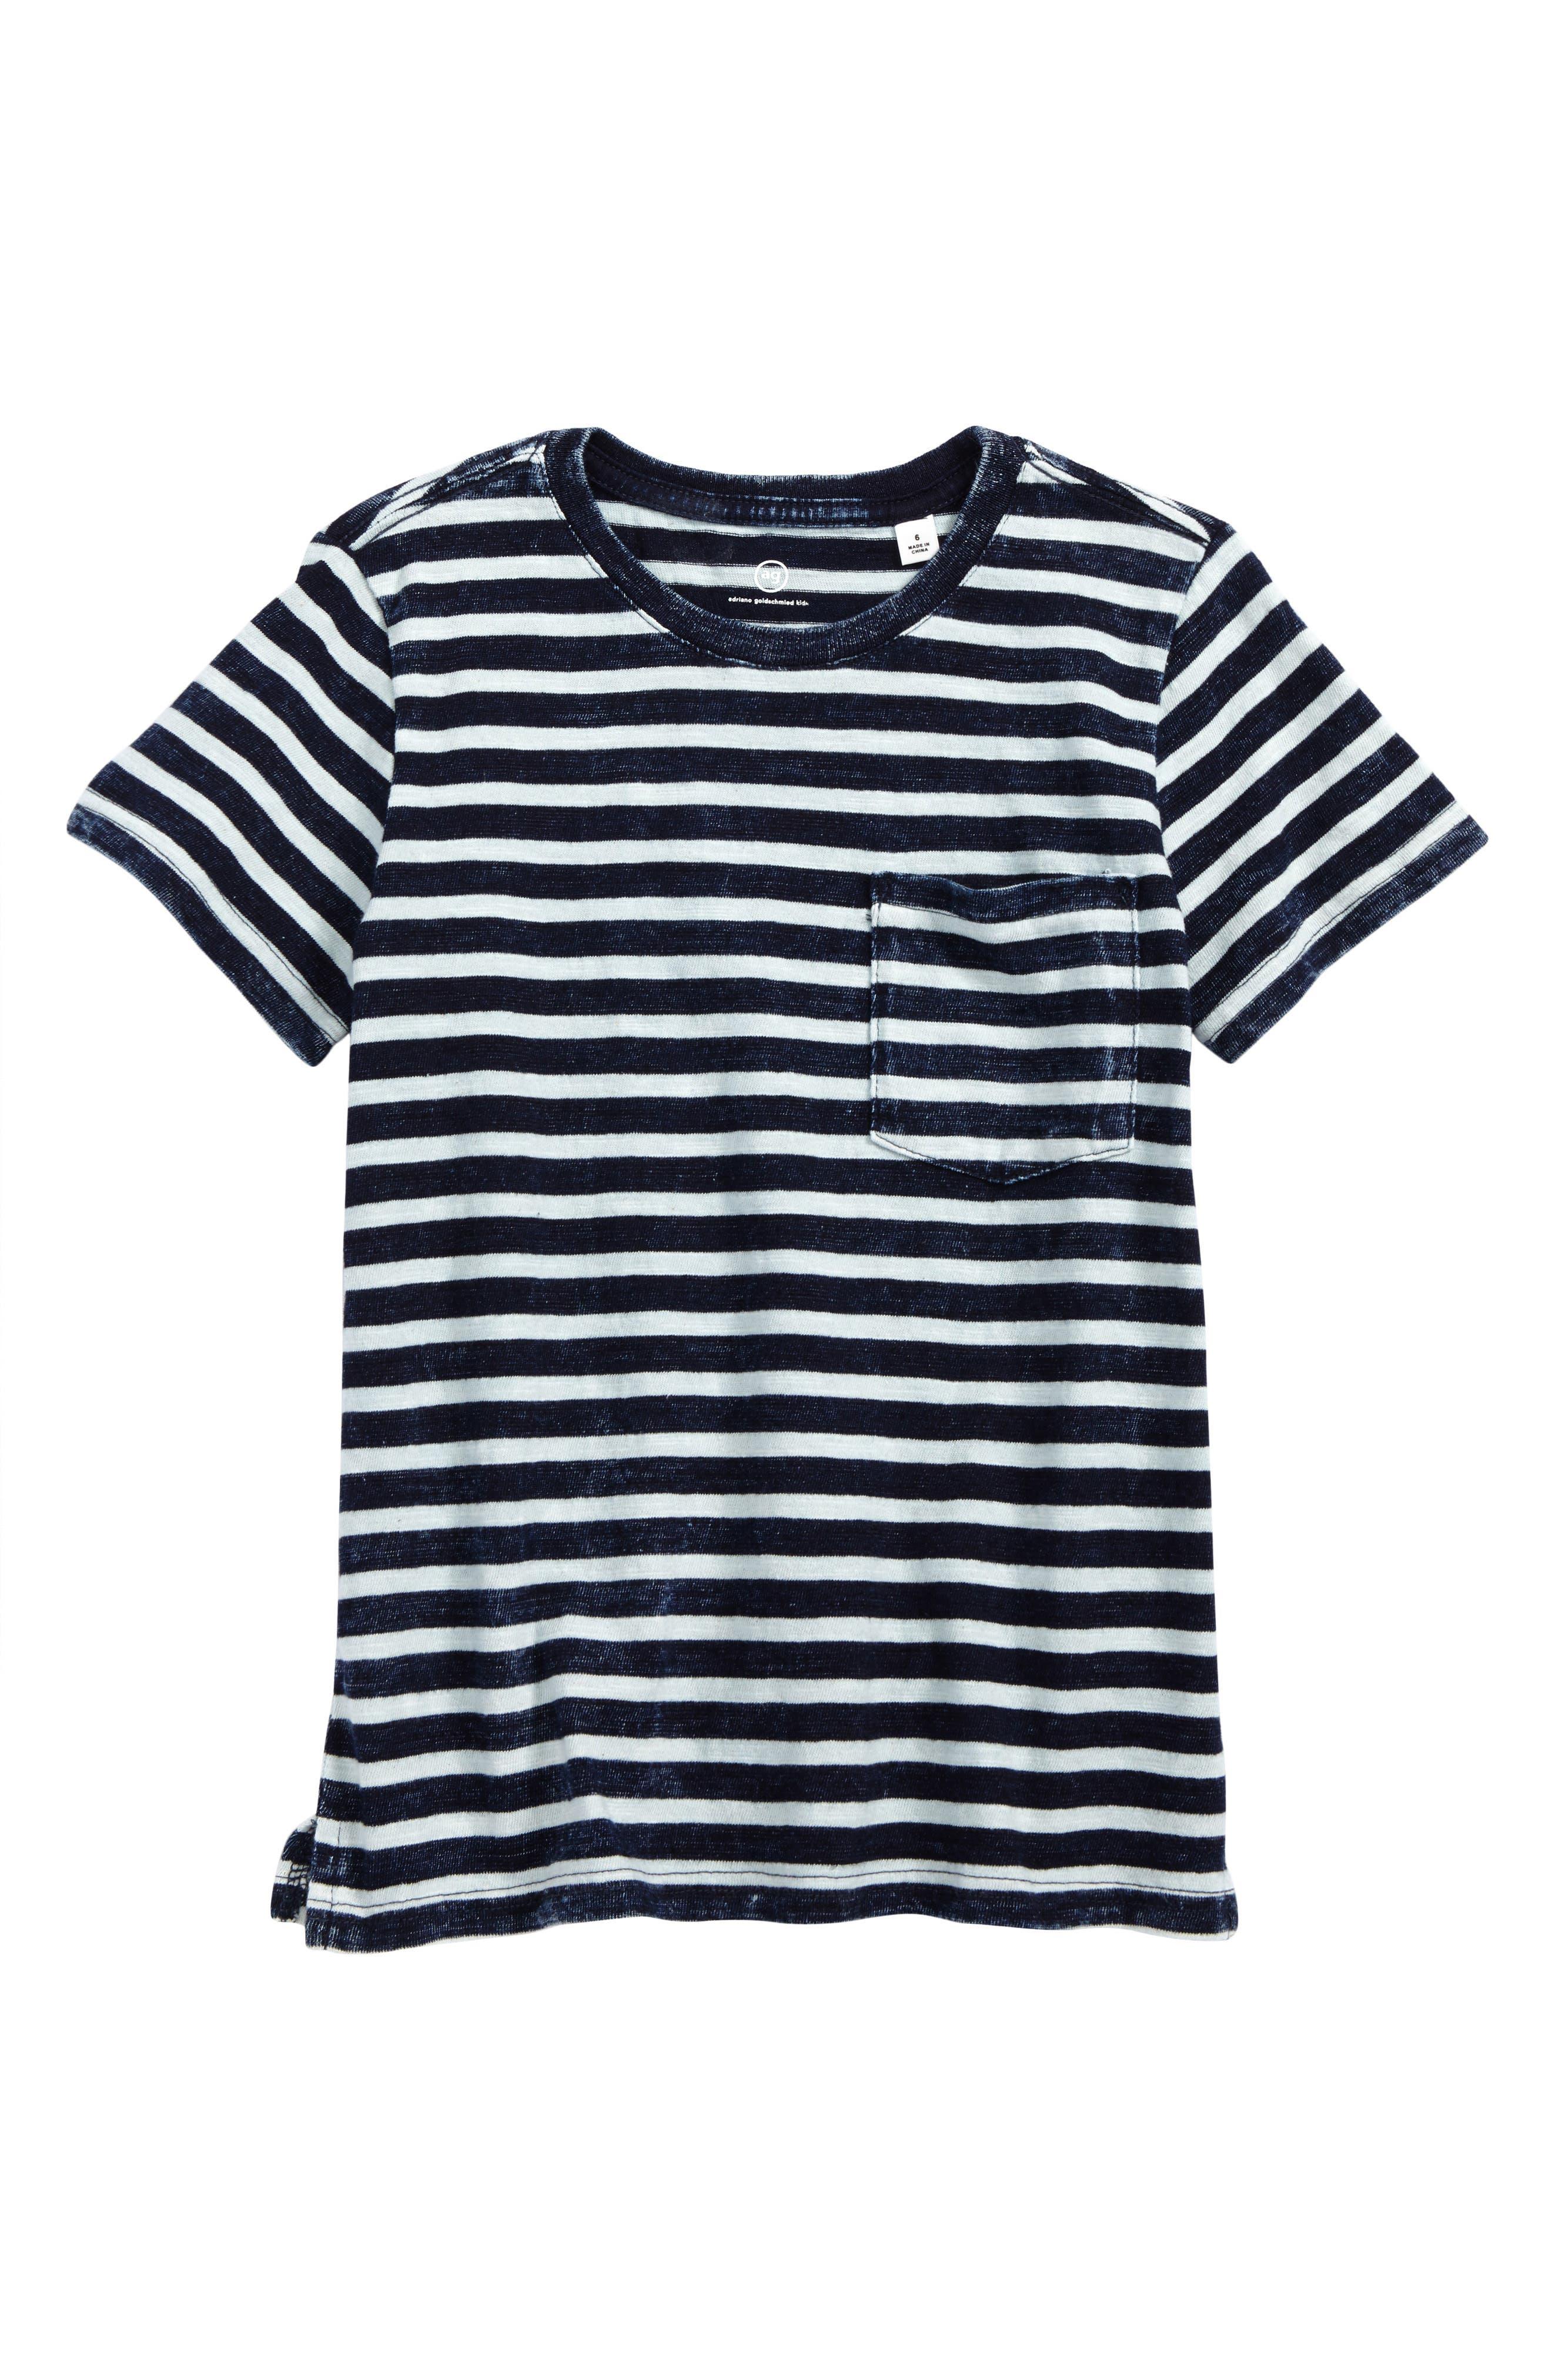 Alternate Image 1 Selected - AG Acid Wash T-Shirt (Little Boys & Big Boys)